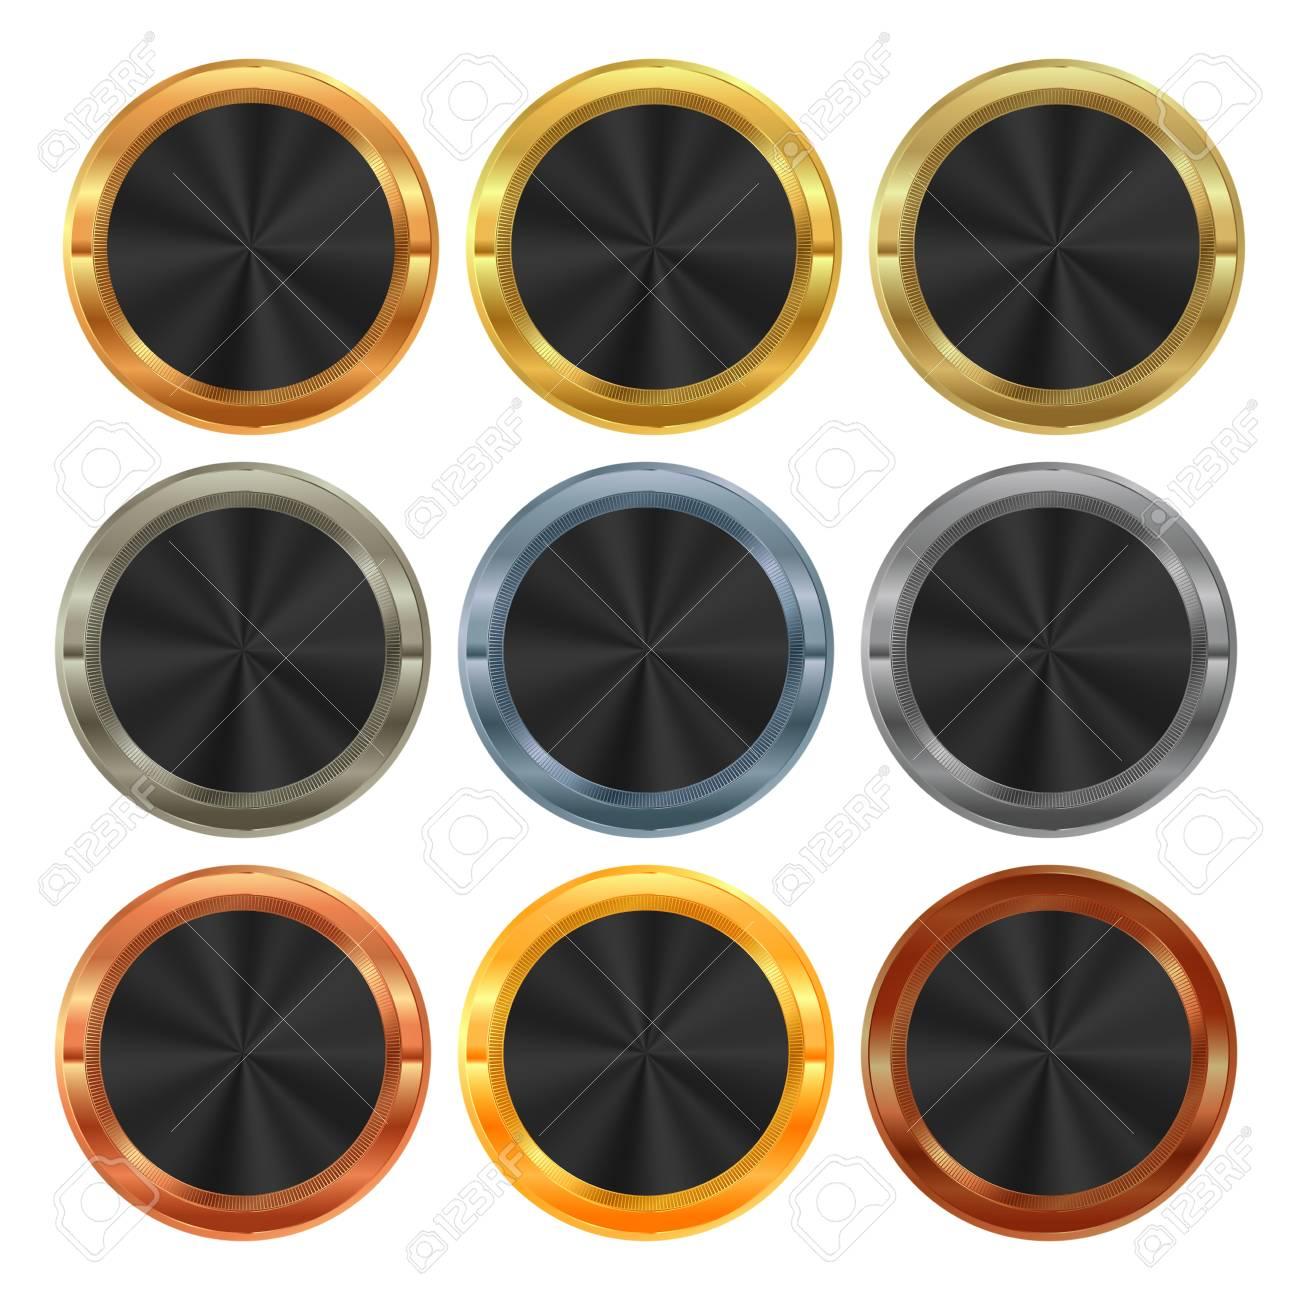 56d79a32d6b4 Foto de archivo - Vectorial Colección de etiquetas de metal Platino Oro  Plata bronce de cobre de aluminio con inserto de latón negro para el texto